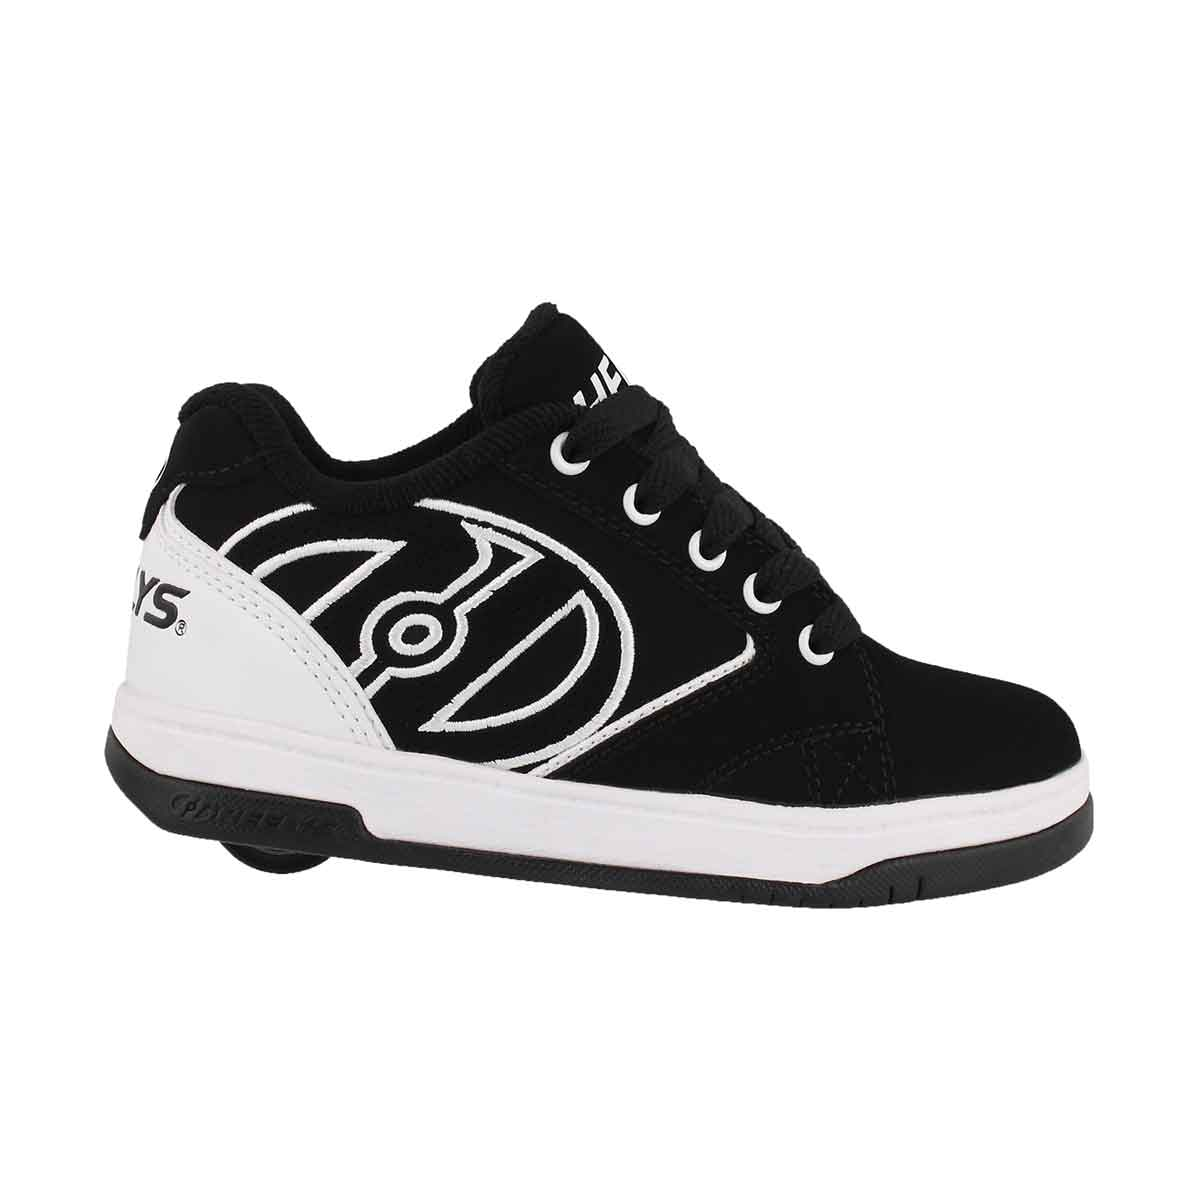 Bys Propel 2.0 blk/wht/wht skate sneaker